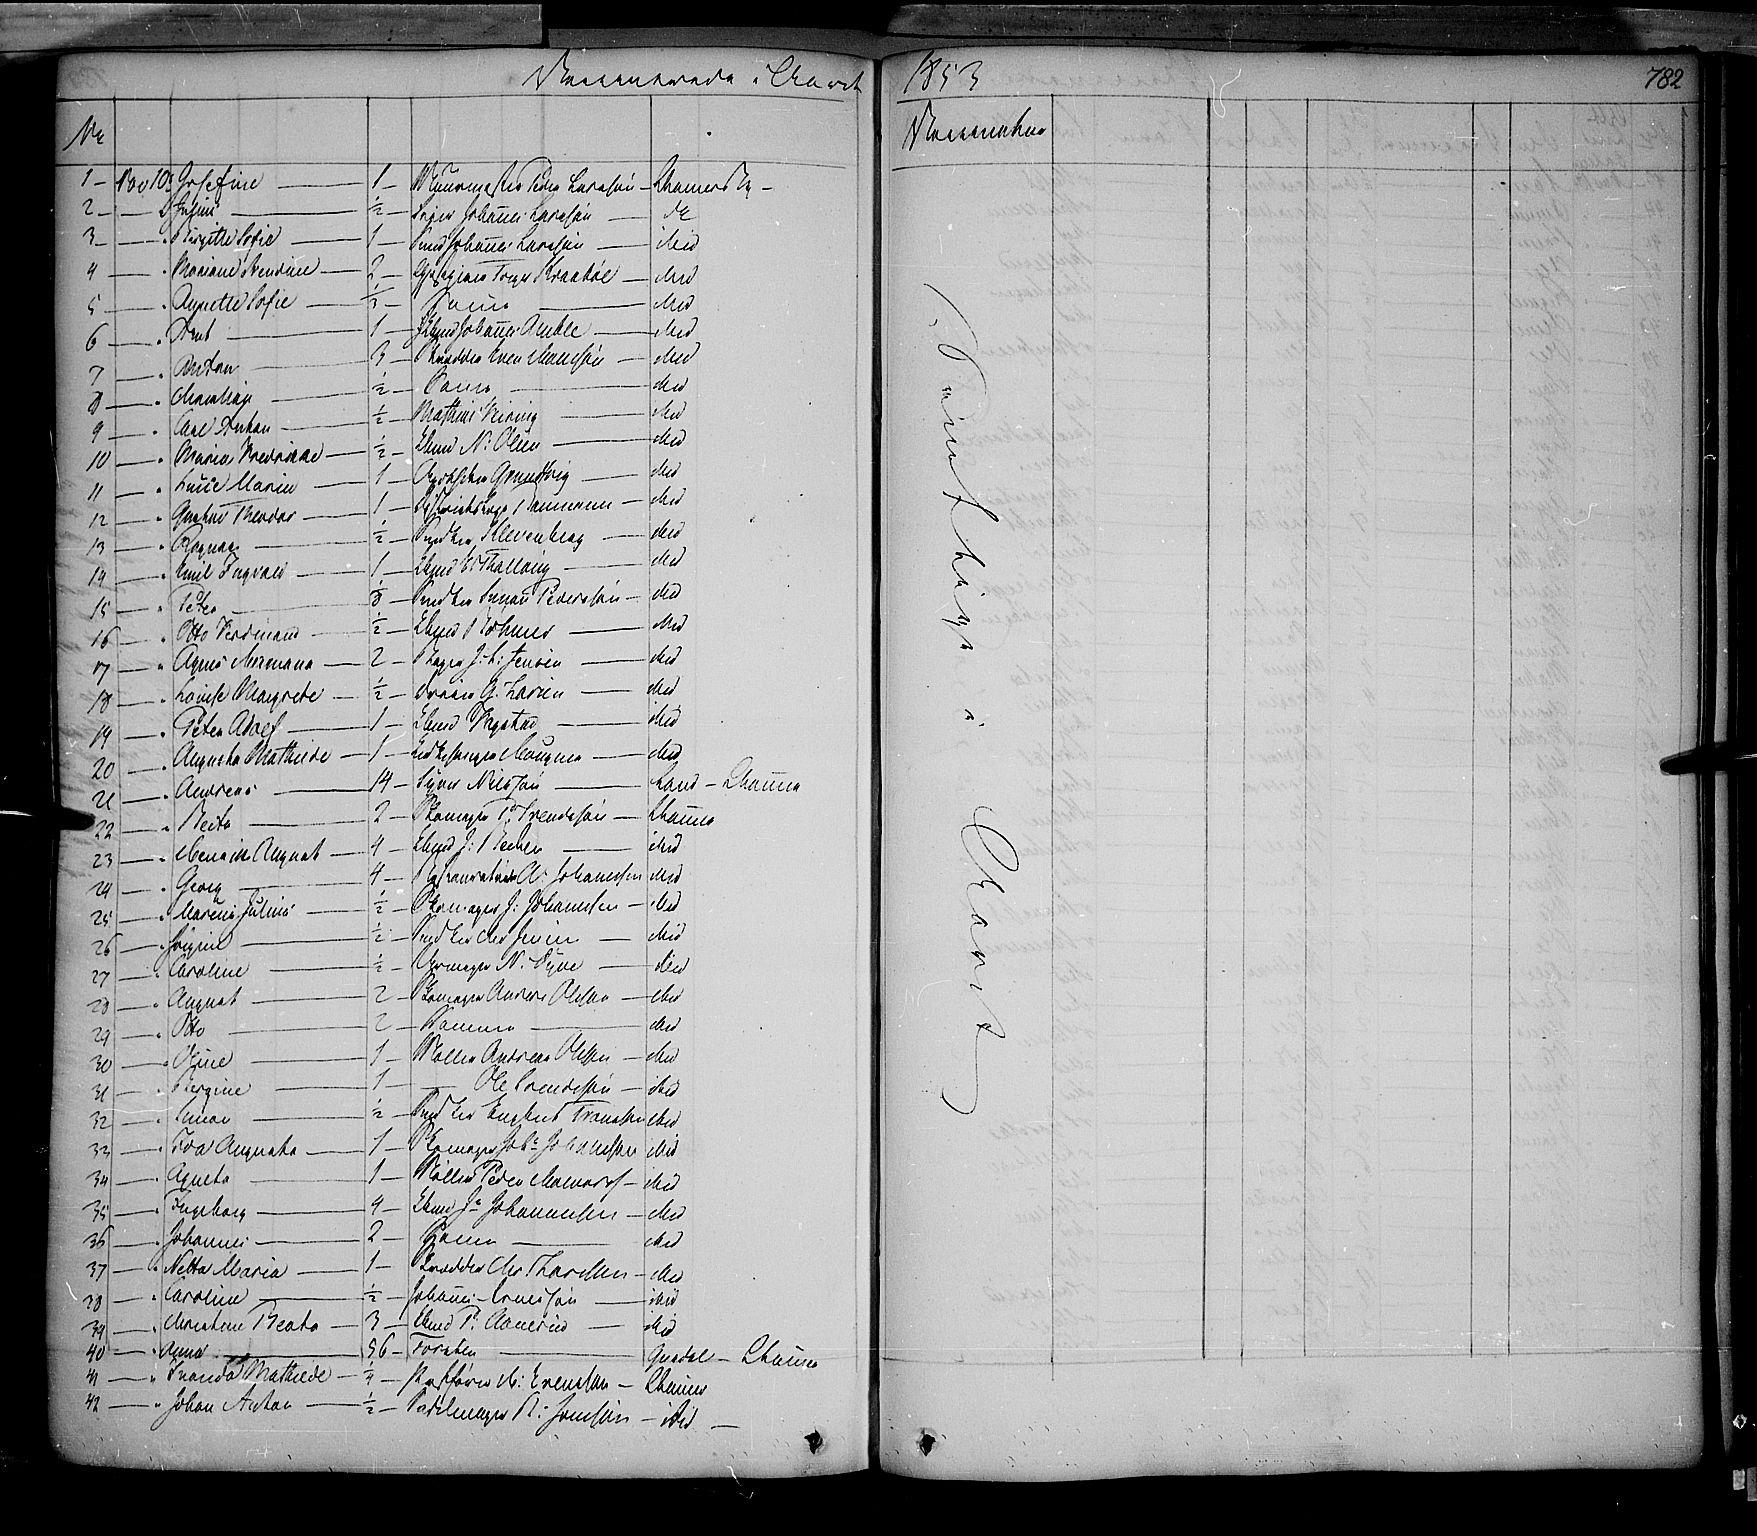 SAH, Fåberg prestekontor, Ministerialbok nr. 5, 1836-1854, s. 781-782